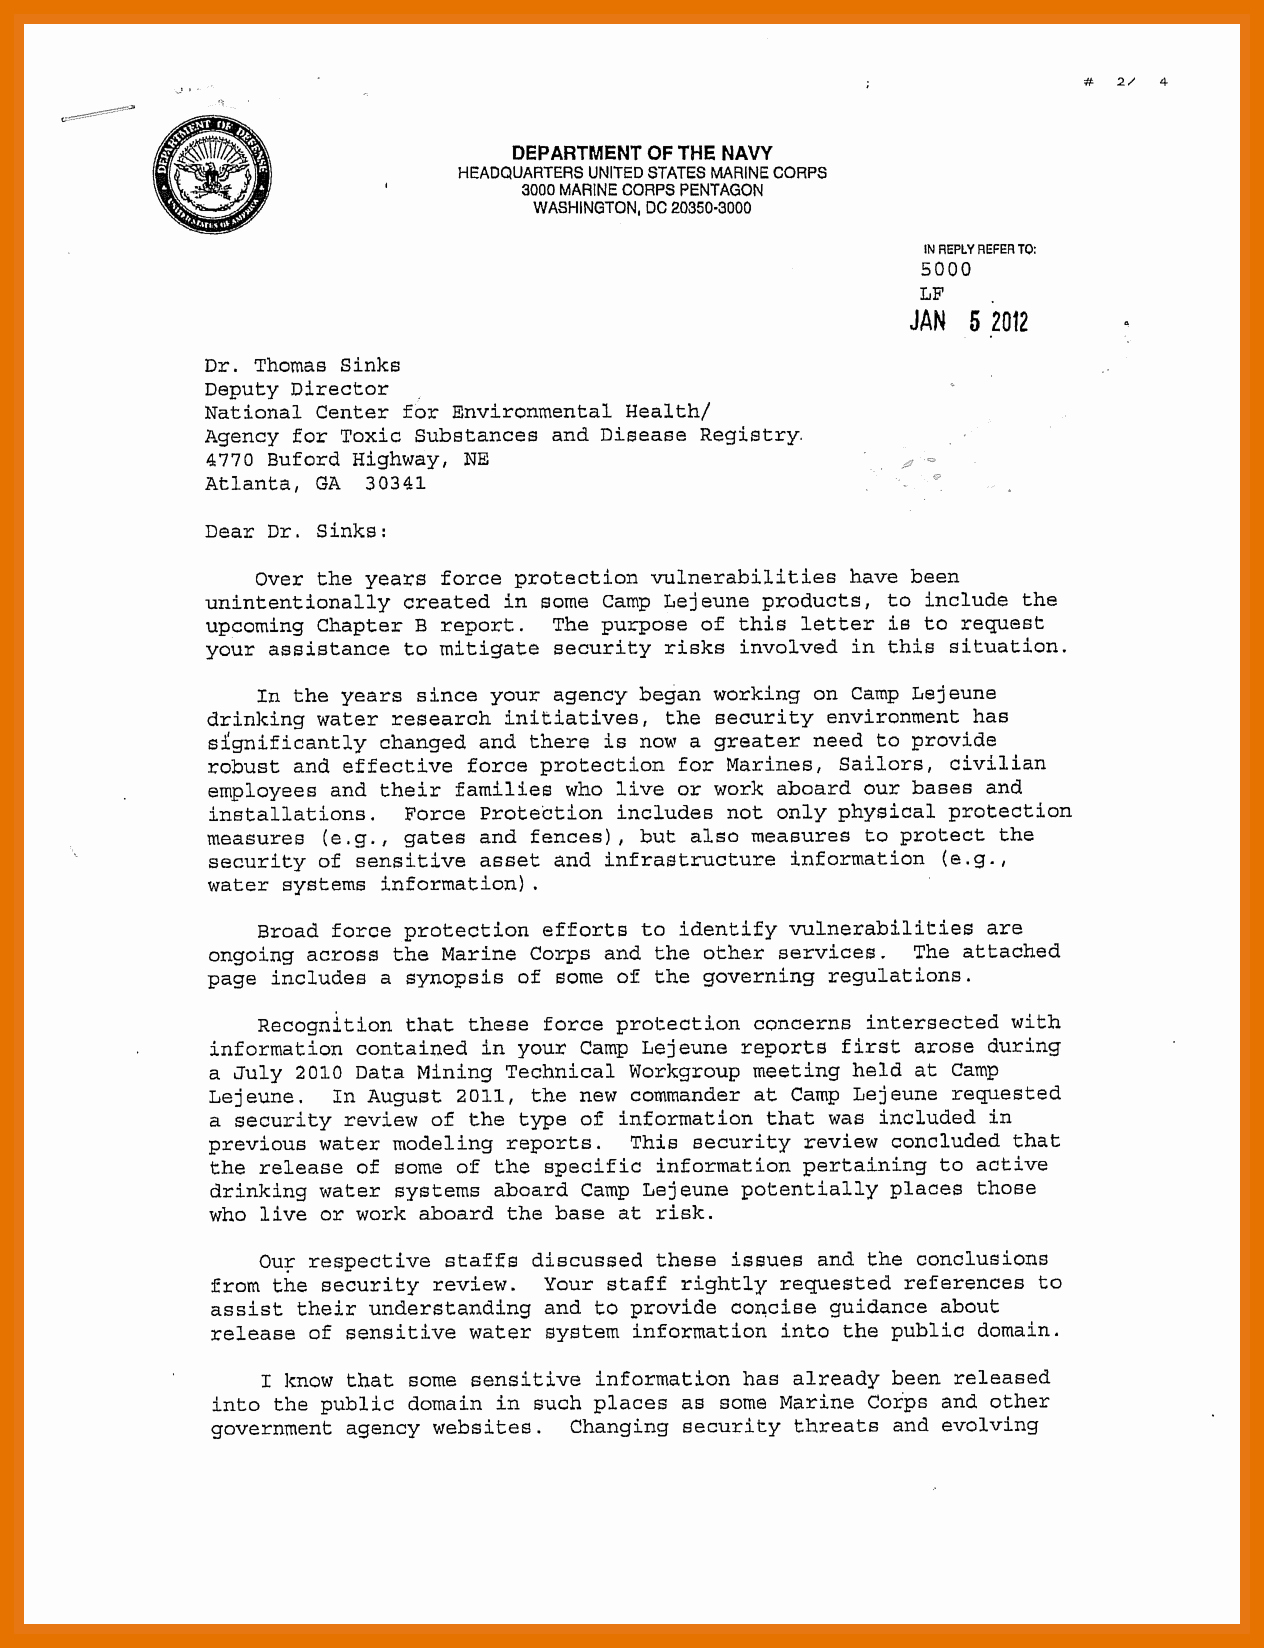 Standard Naval Letter format Awesome 5 6 Naval Letter format